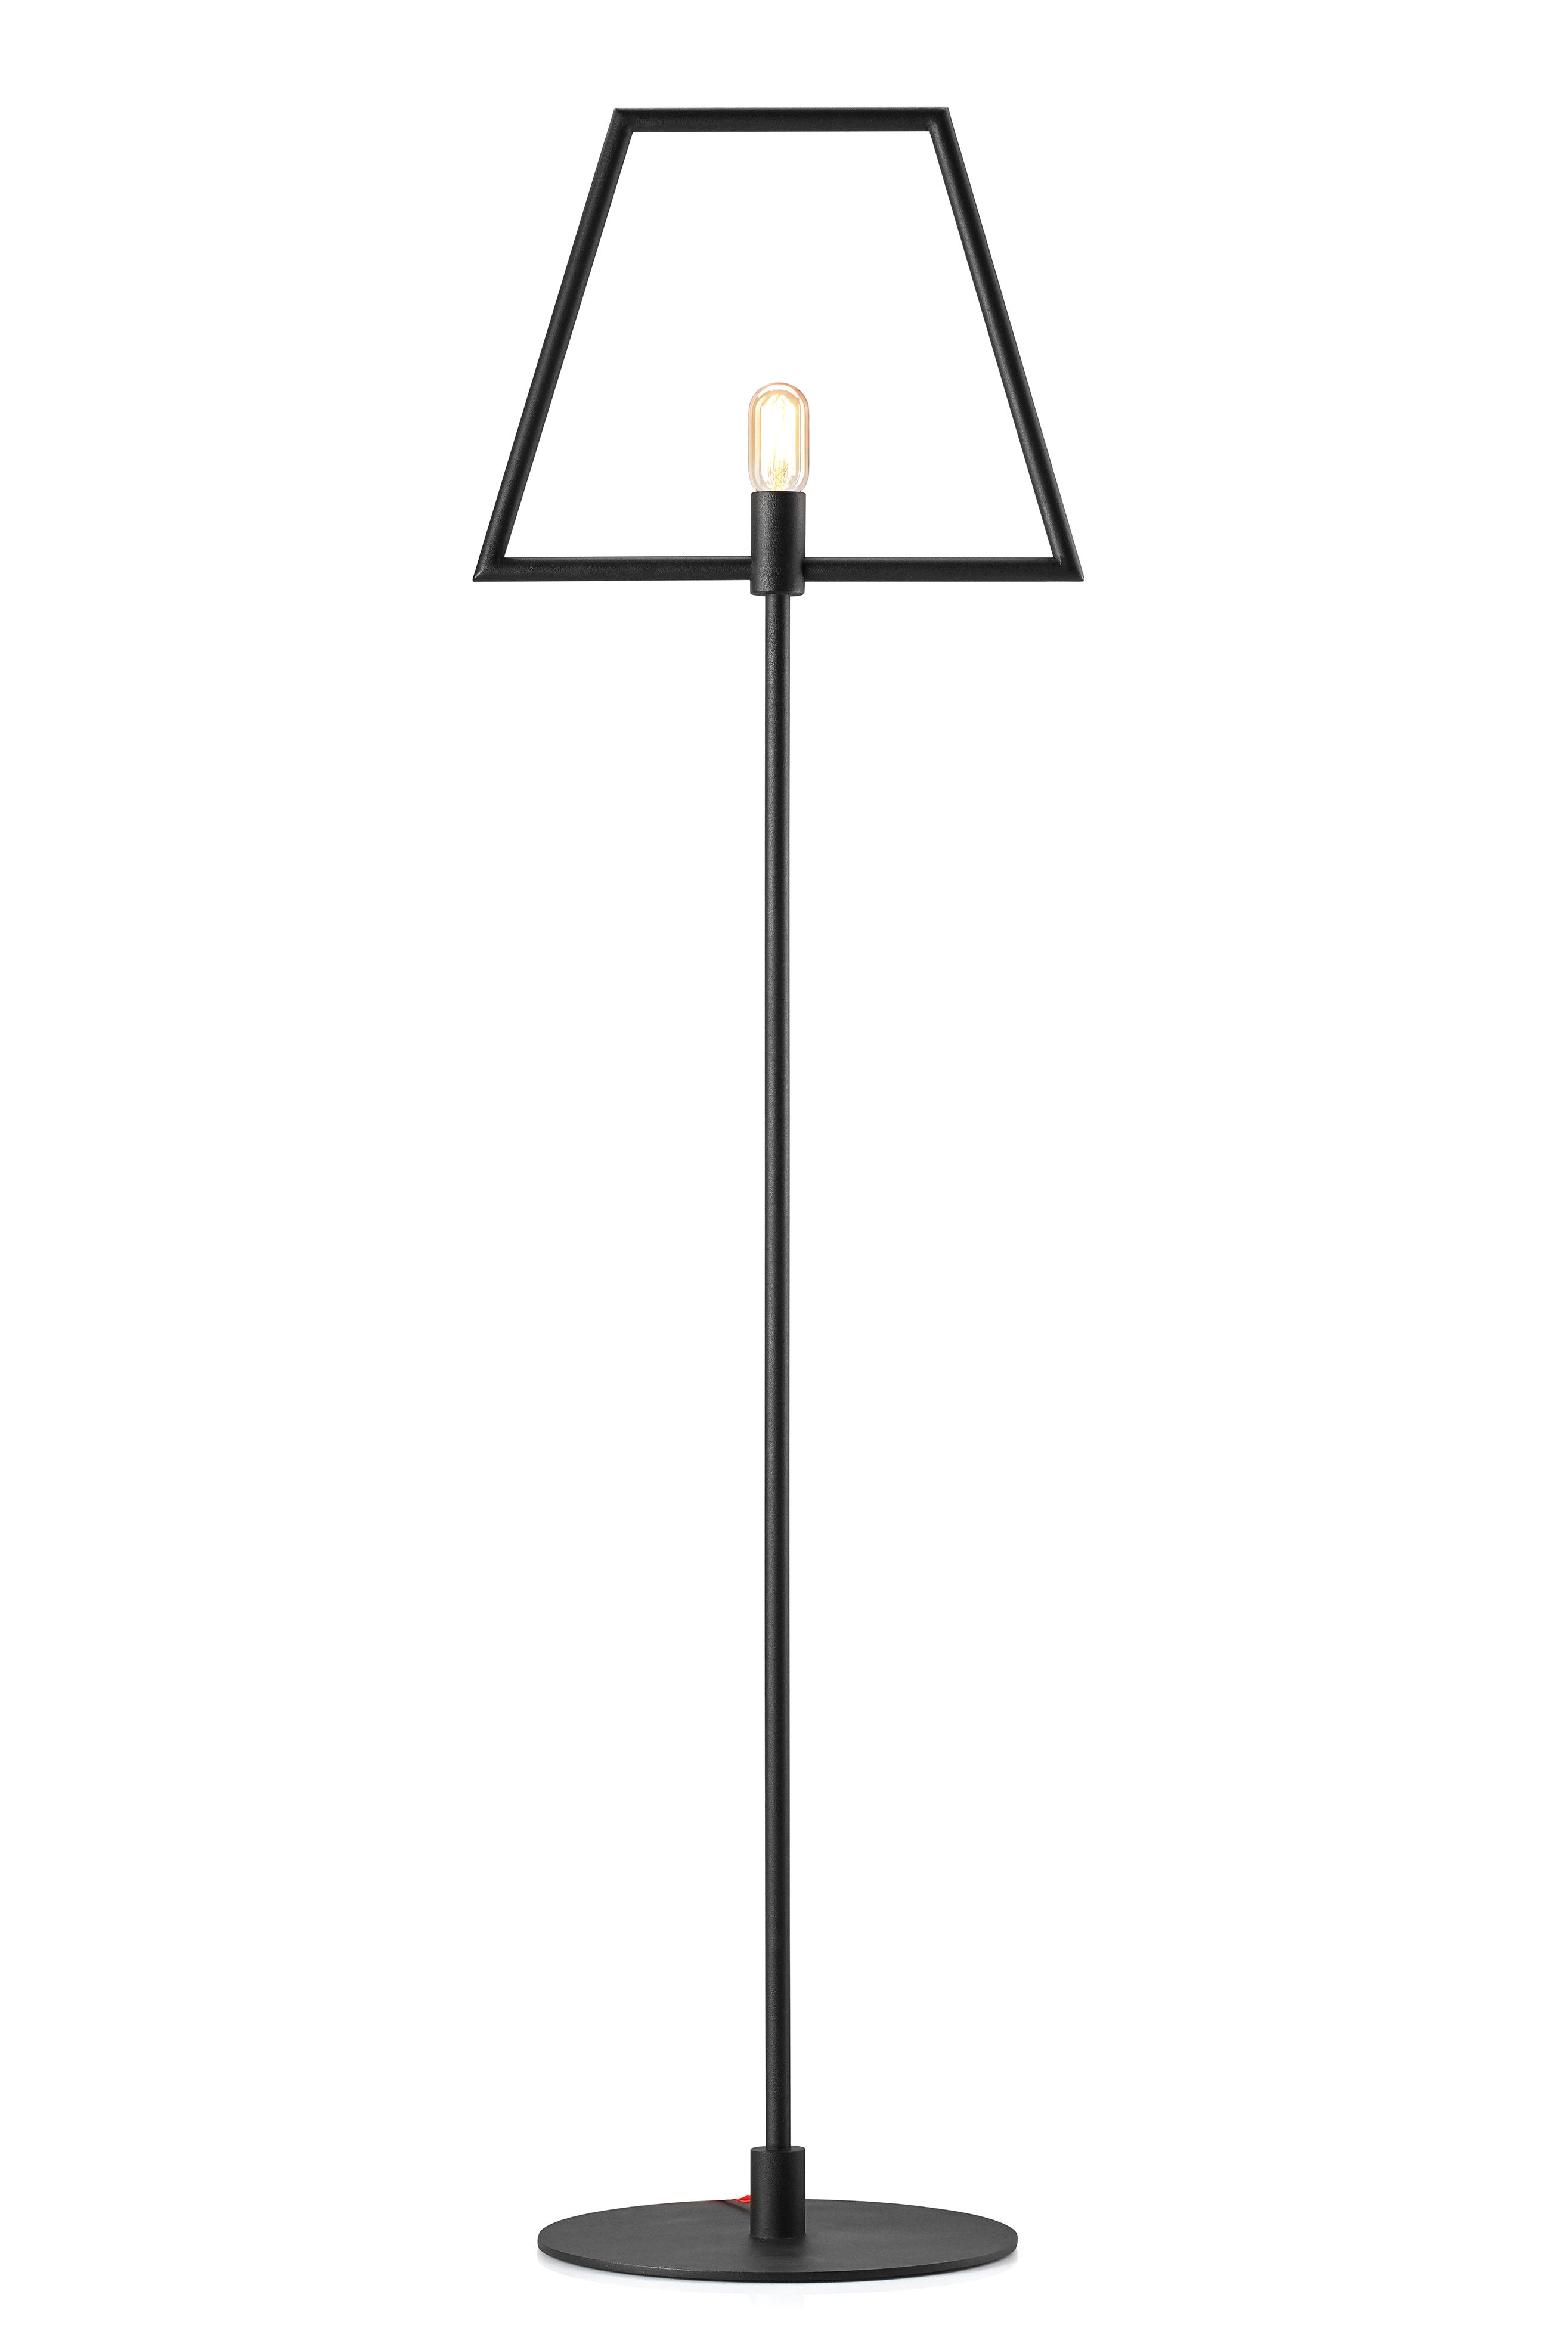 2d Series Lamp Floor Lamp Classic Floor Lamps